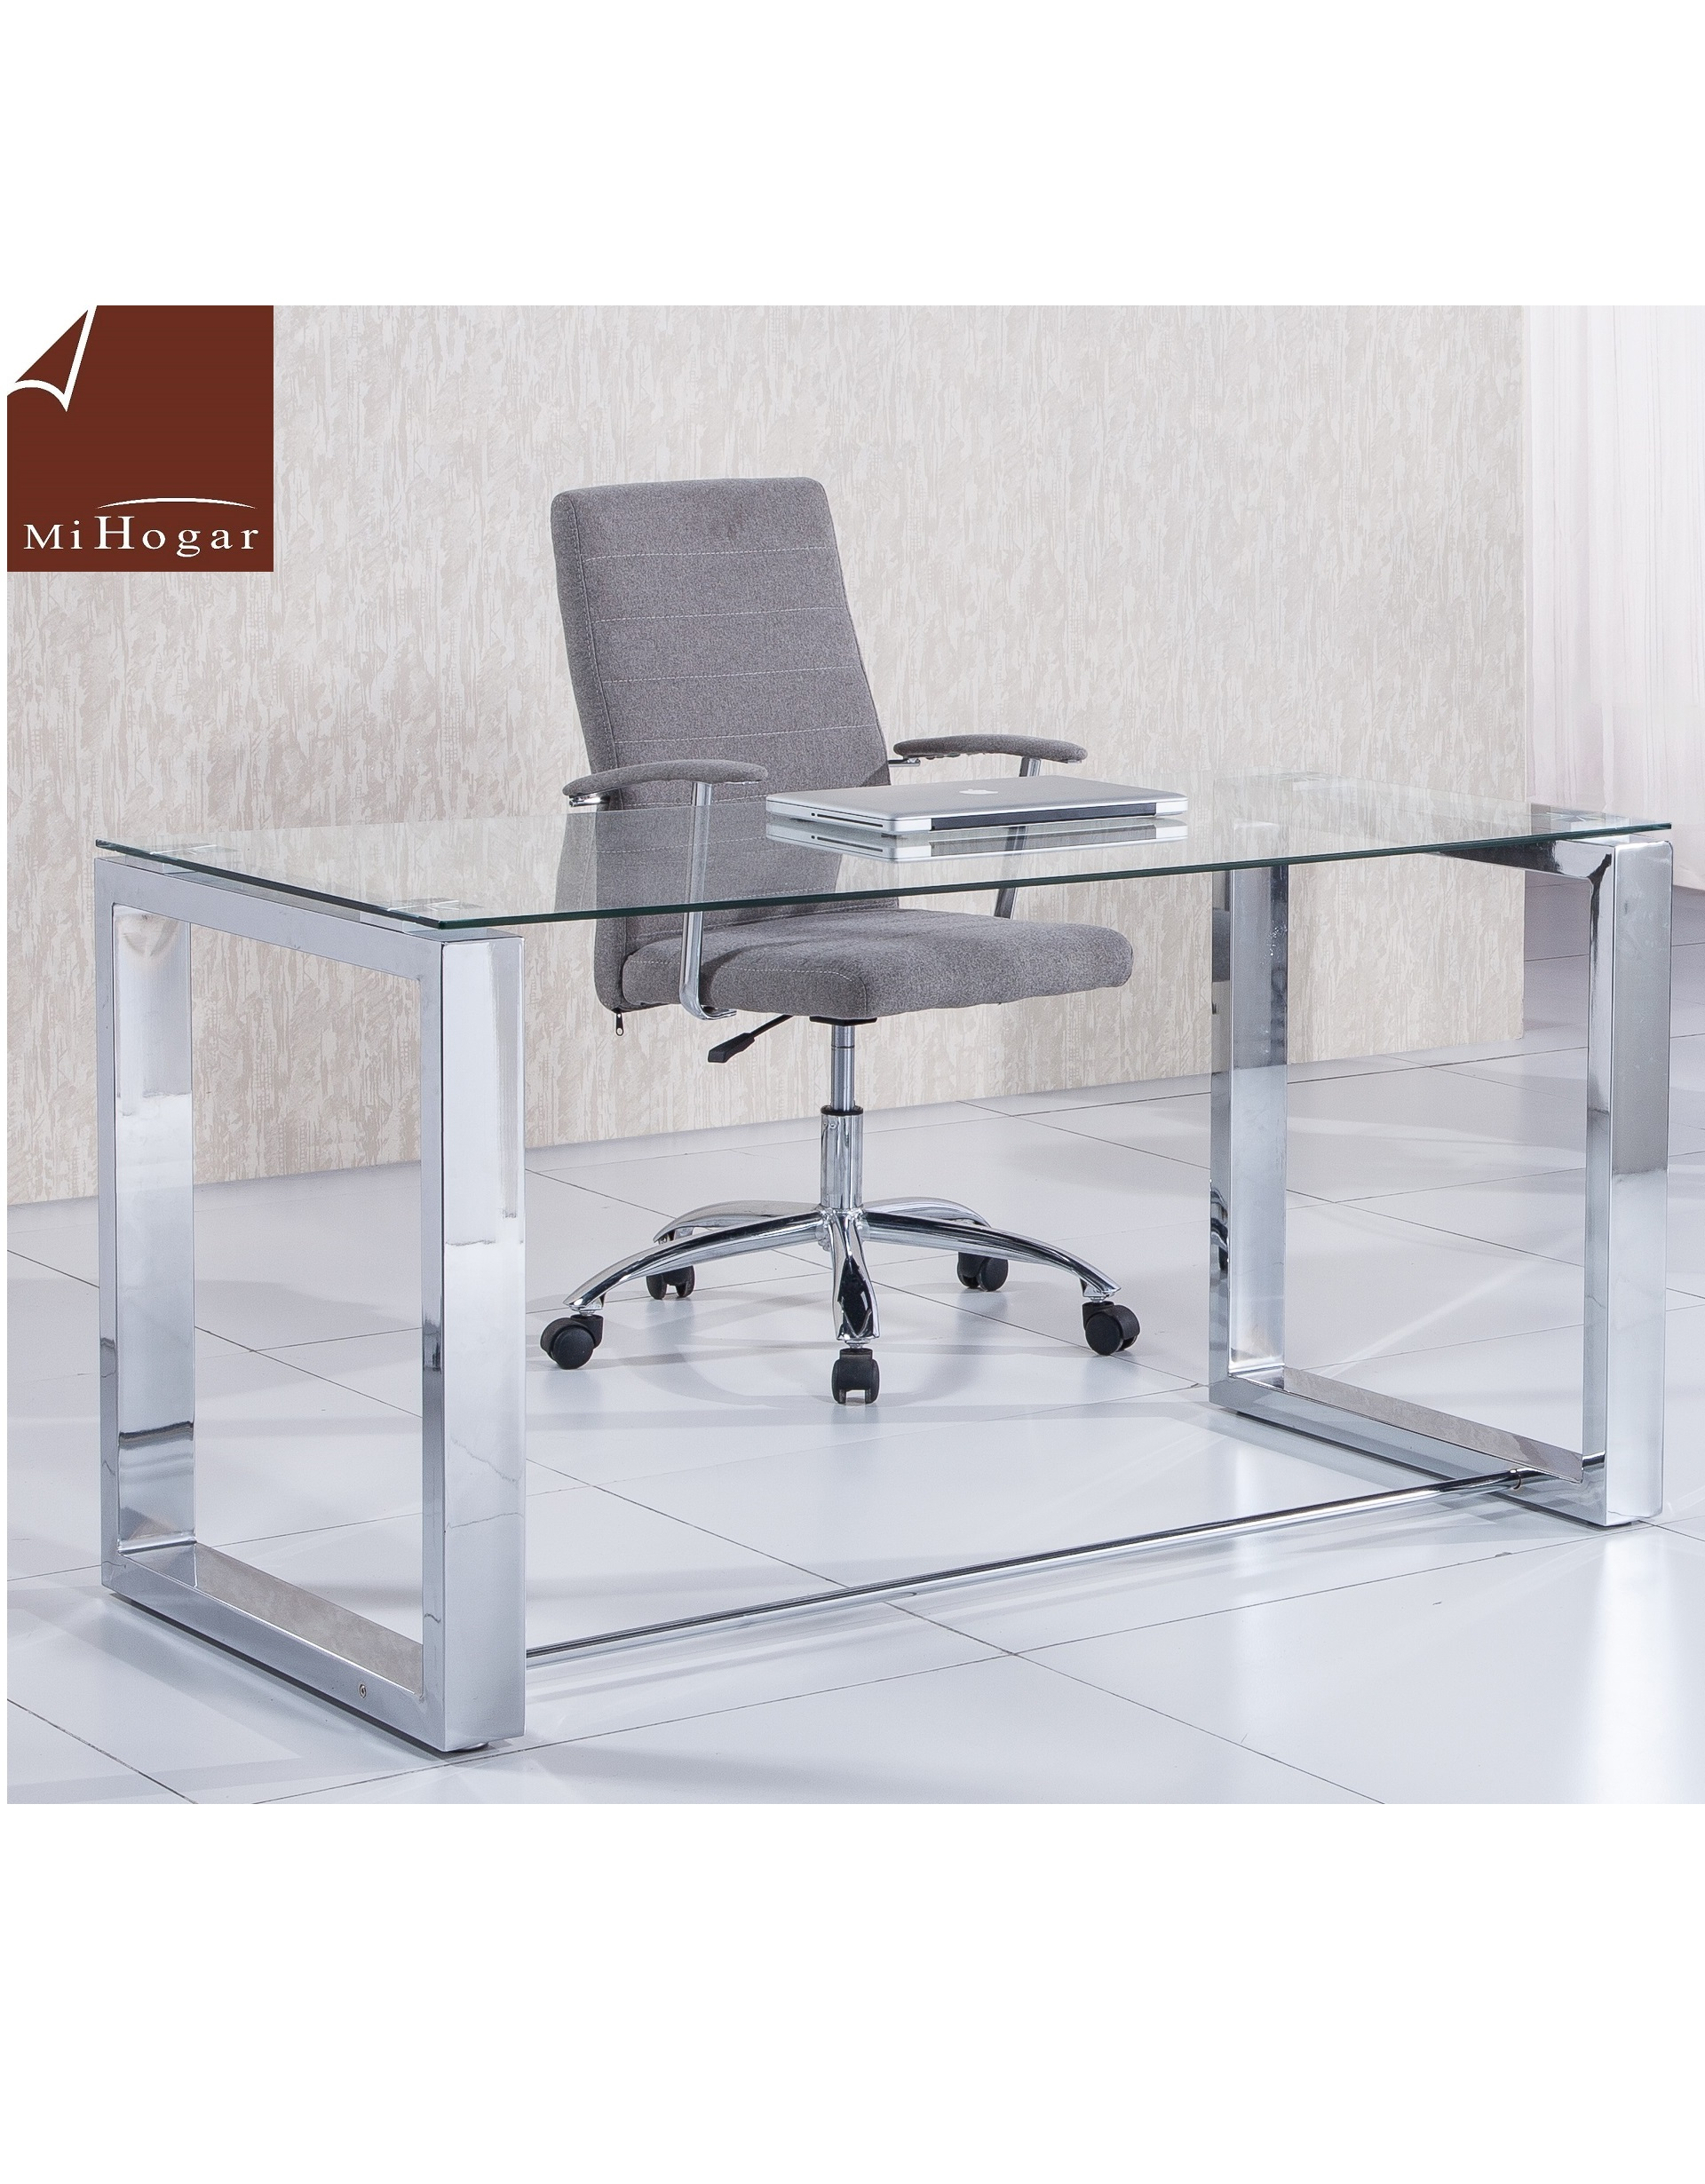 mesa-despacho-cristal-amsterdam-140x70 1